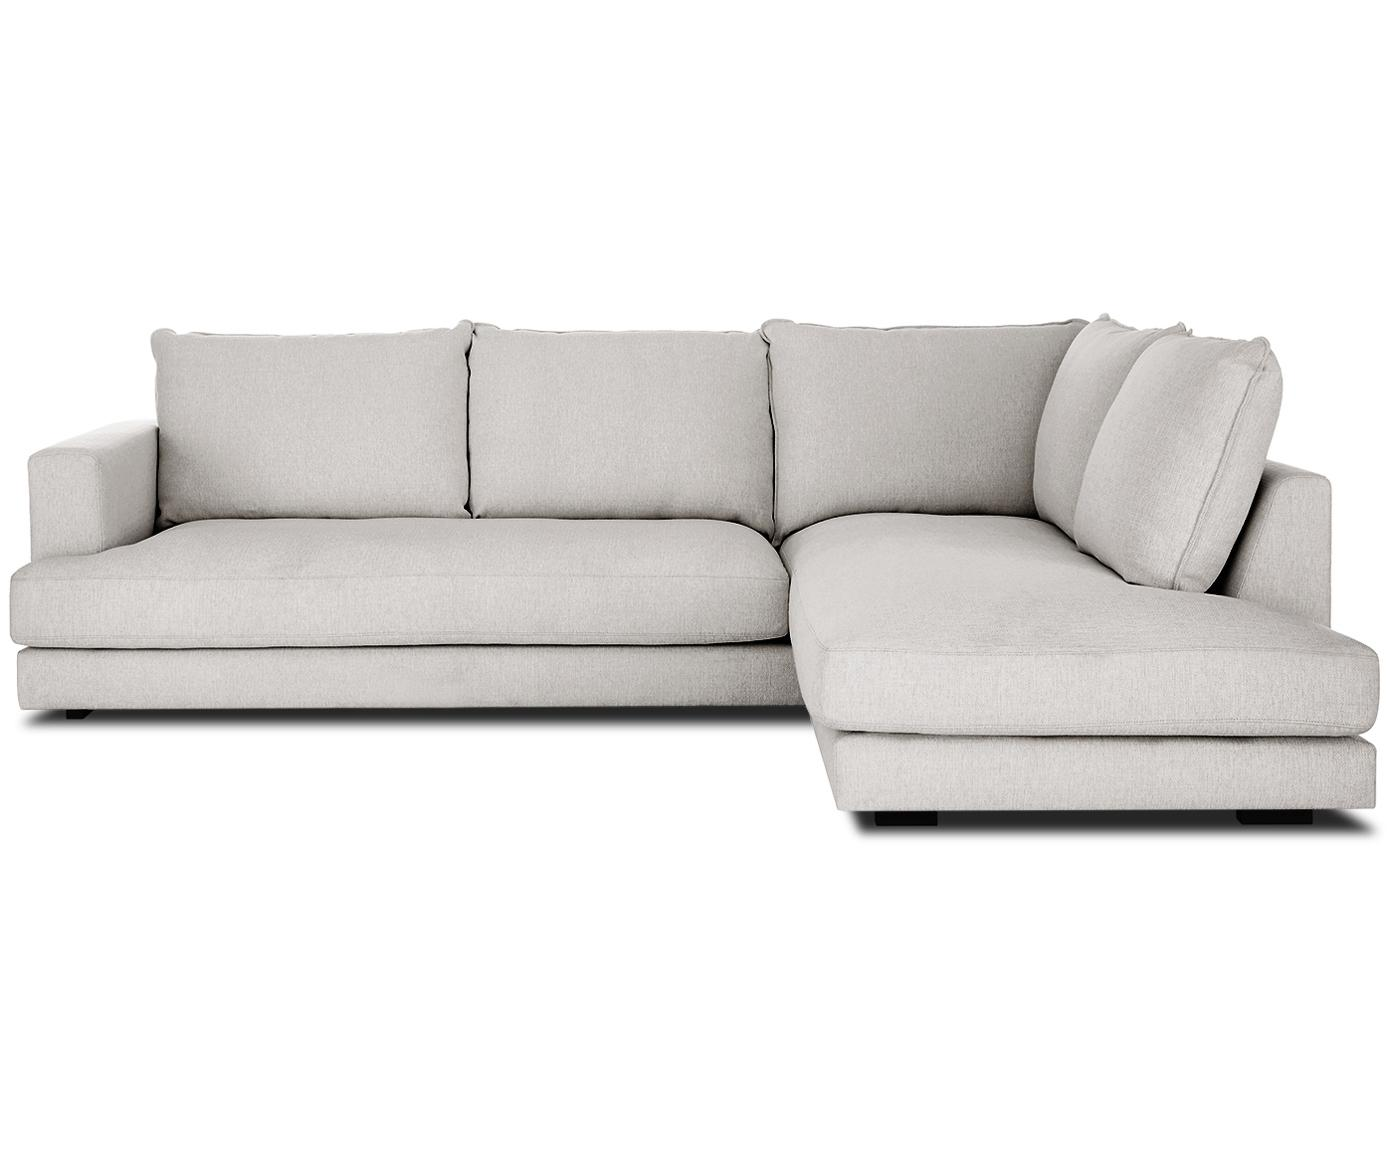 Grote hoekbank Tribeca, Bekleding: polyester, Zitvlak: schuimvulling, vezelmater, Frame: massief grenenhout, Poten: massief gelakt beukenhout, Grijs, B 274 x D 196 cm